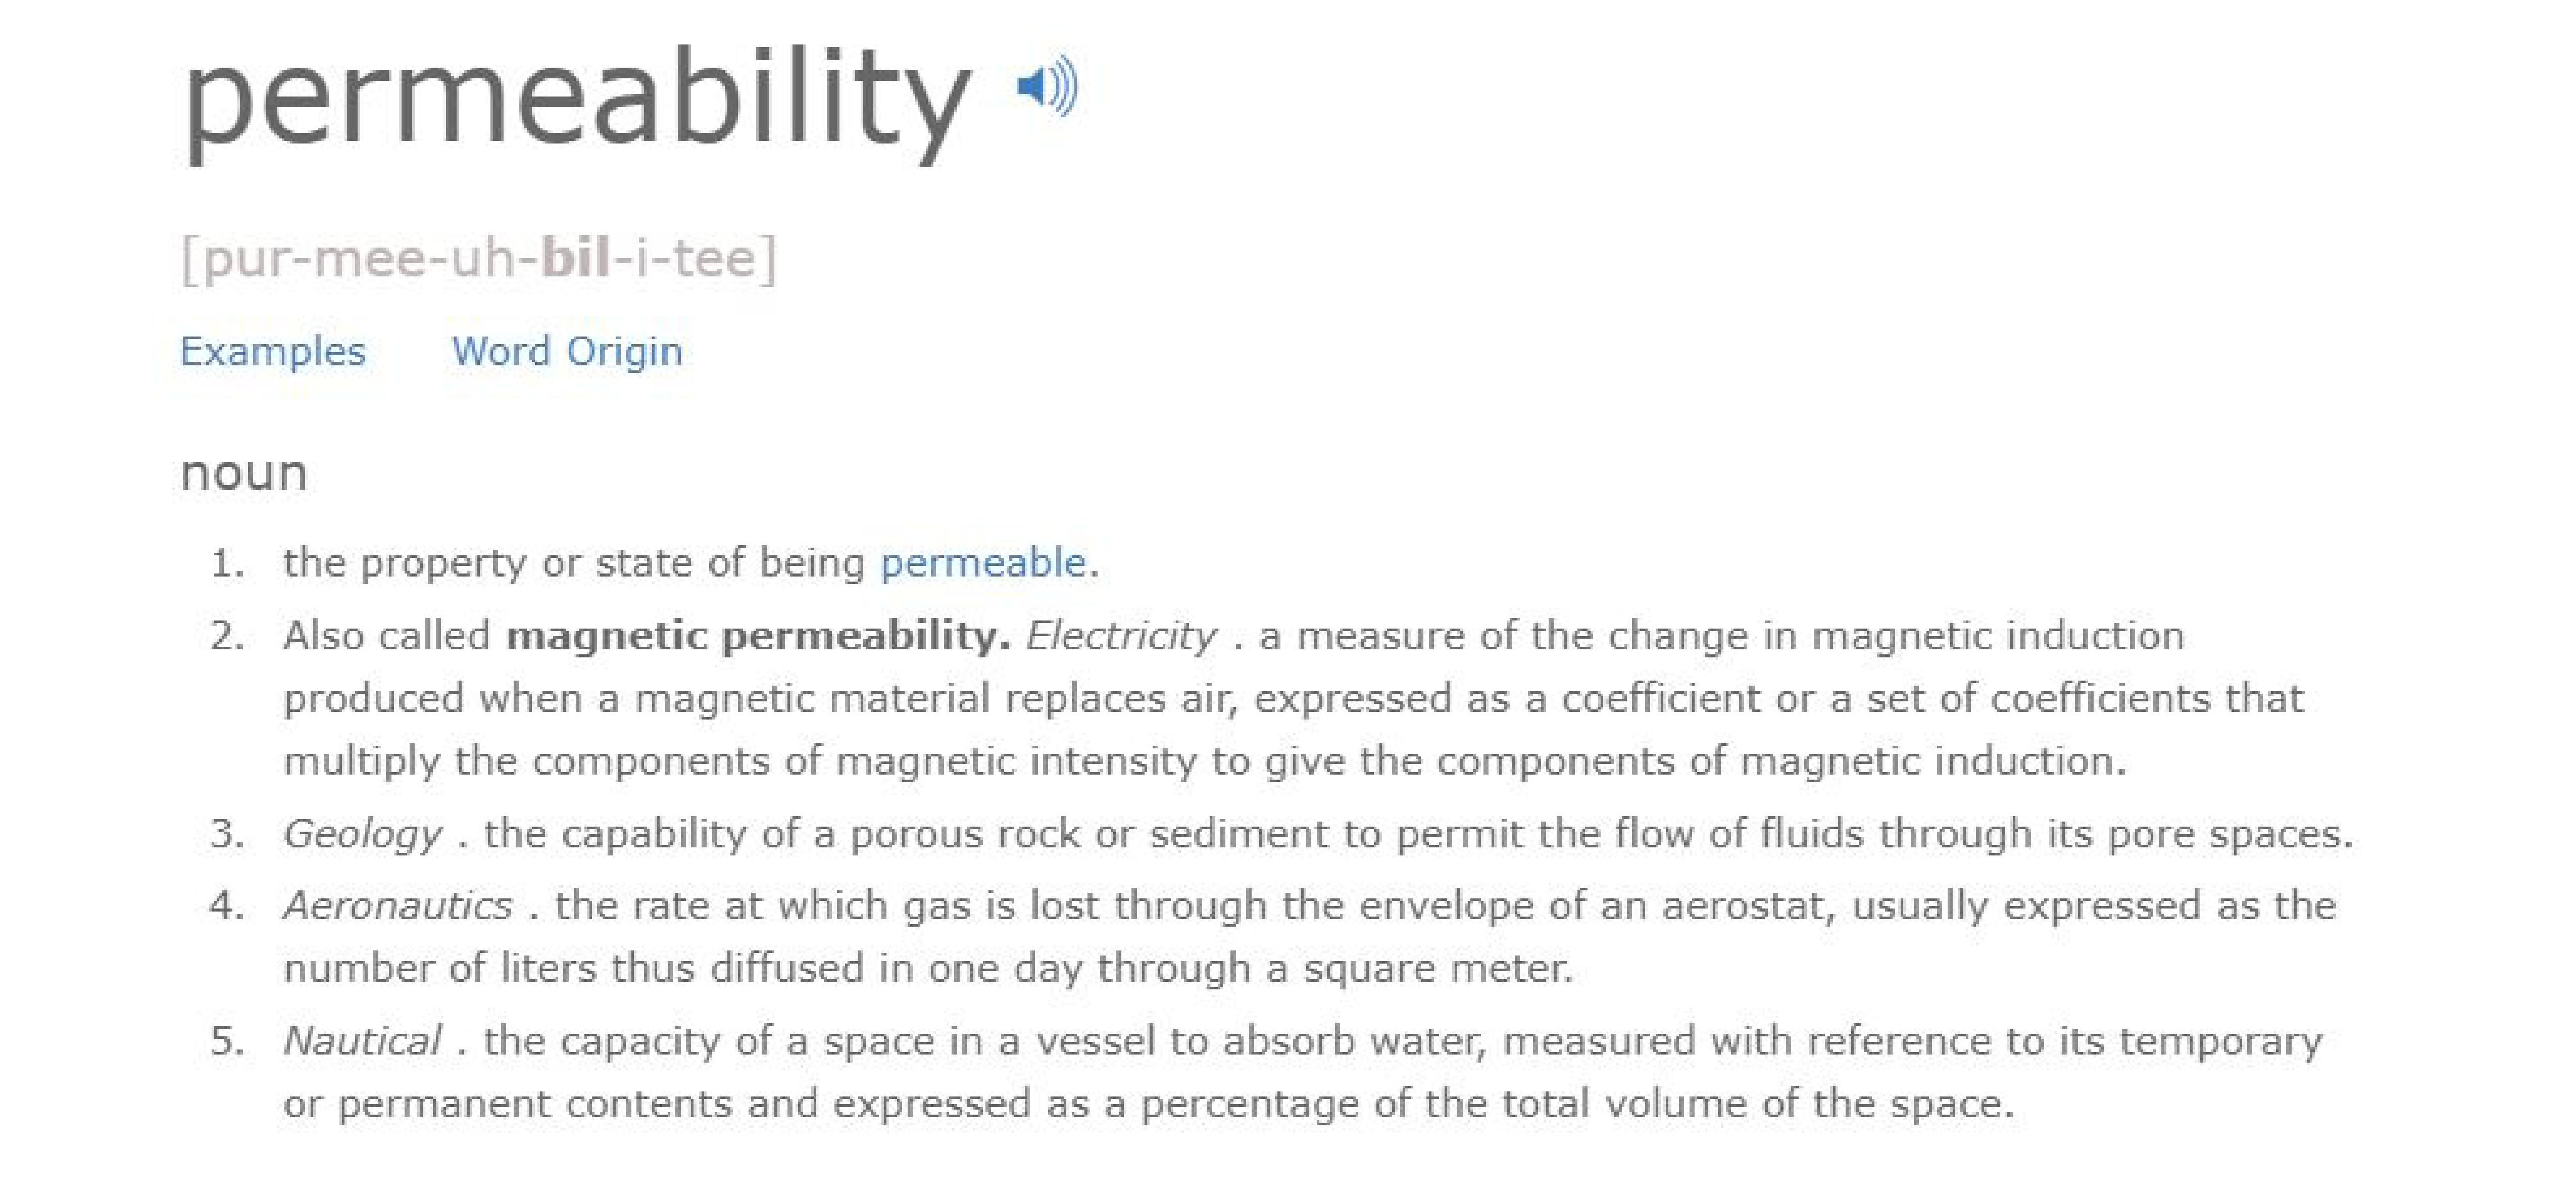 permeability definition.JPG